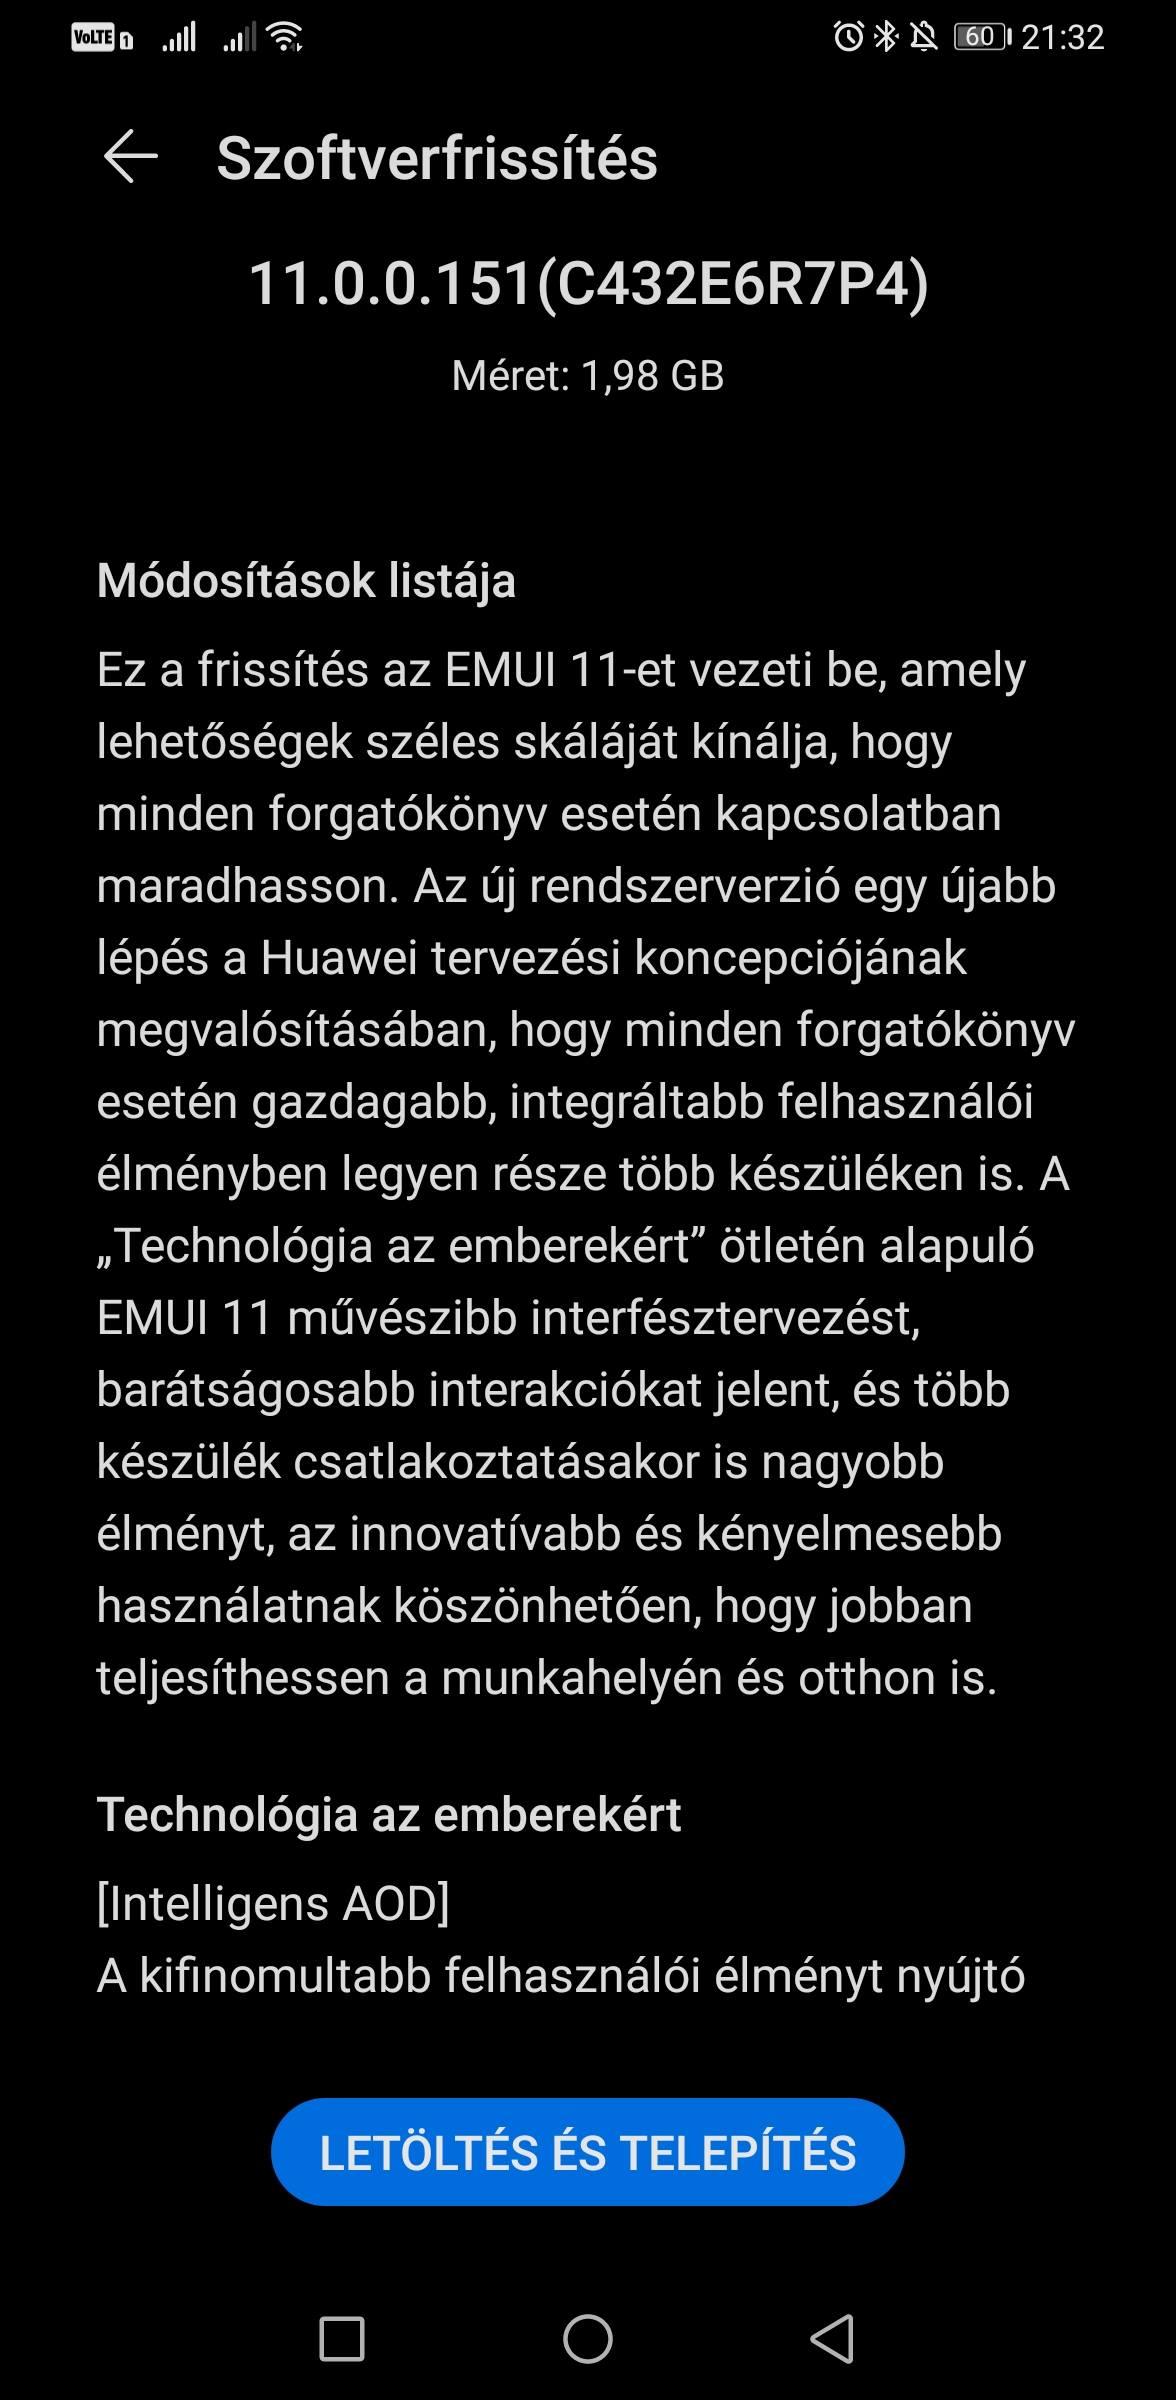 Huawei Mate 30 Pro EMUI 11 frissítés